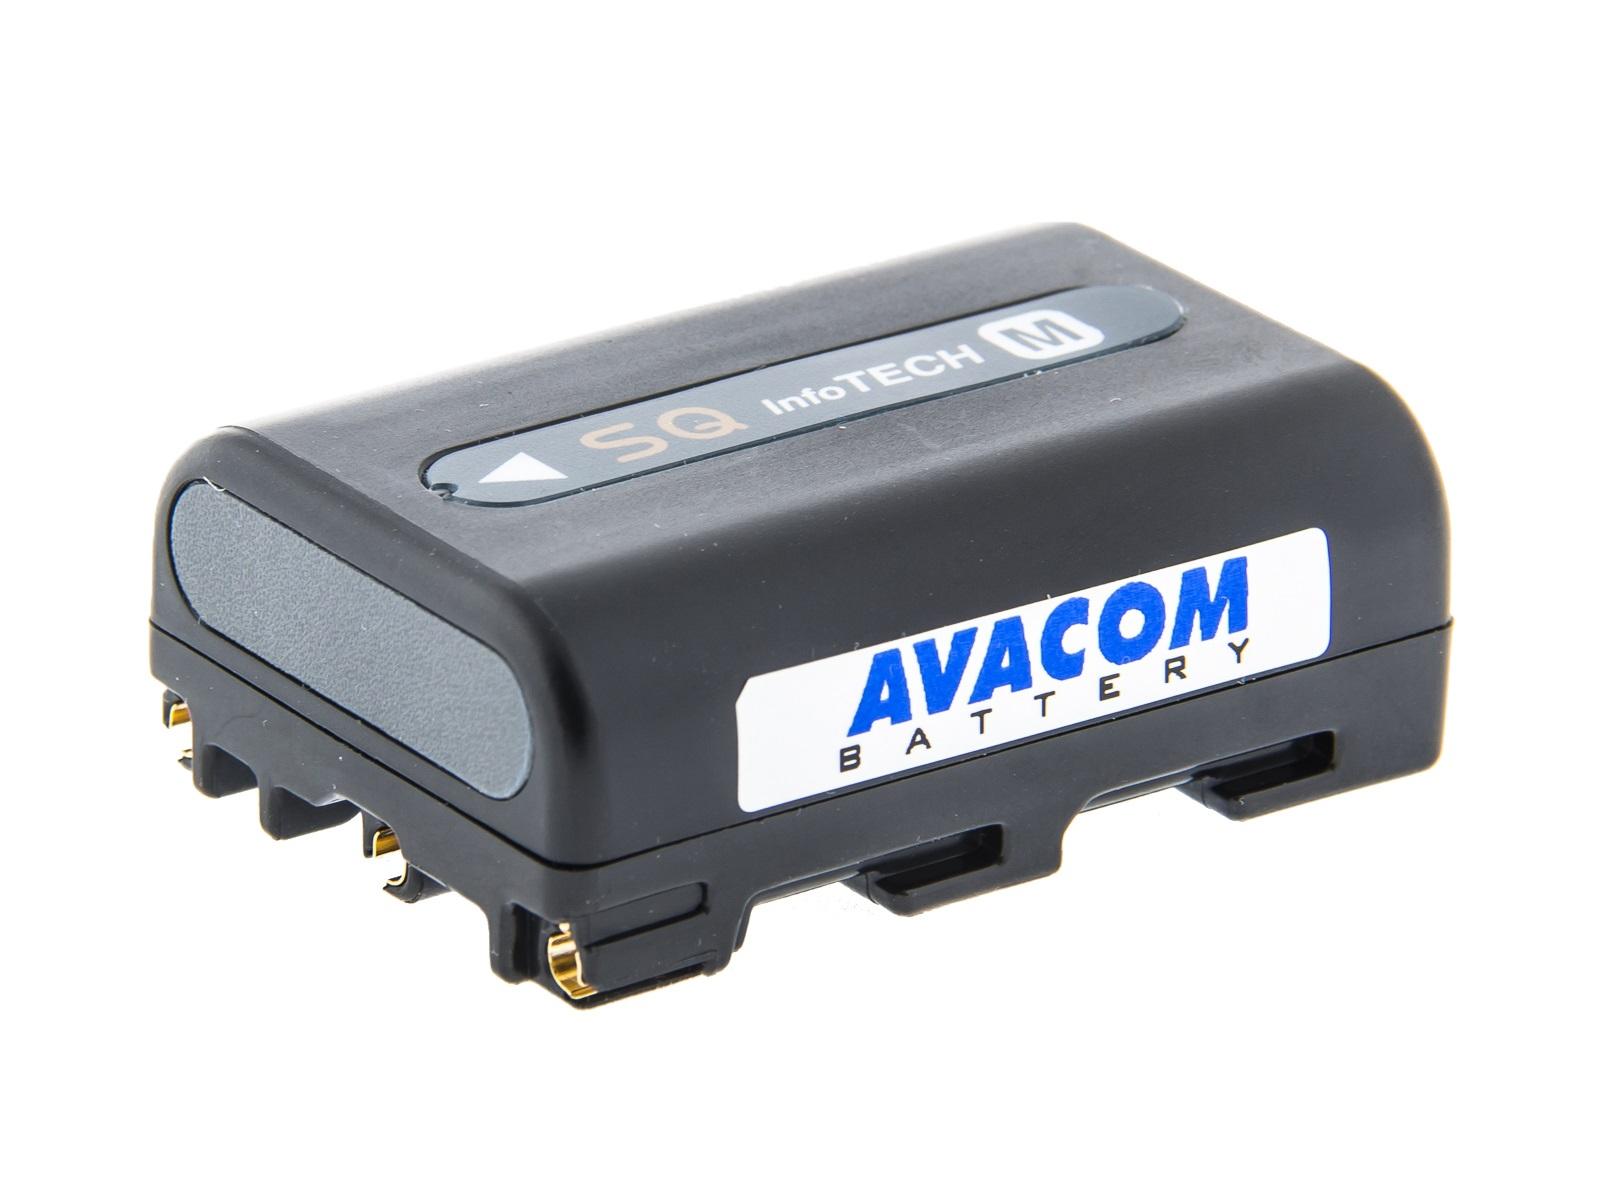 Baterie AVACOM Sony NP-FM50, QM50 Li-Ion 7.2V 1100mAh 7.9Wh tmavě šedá